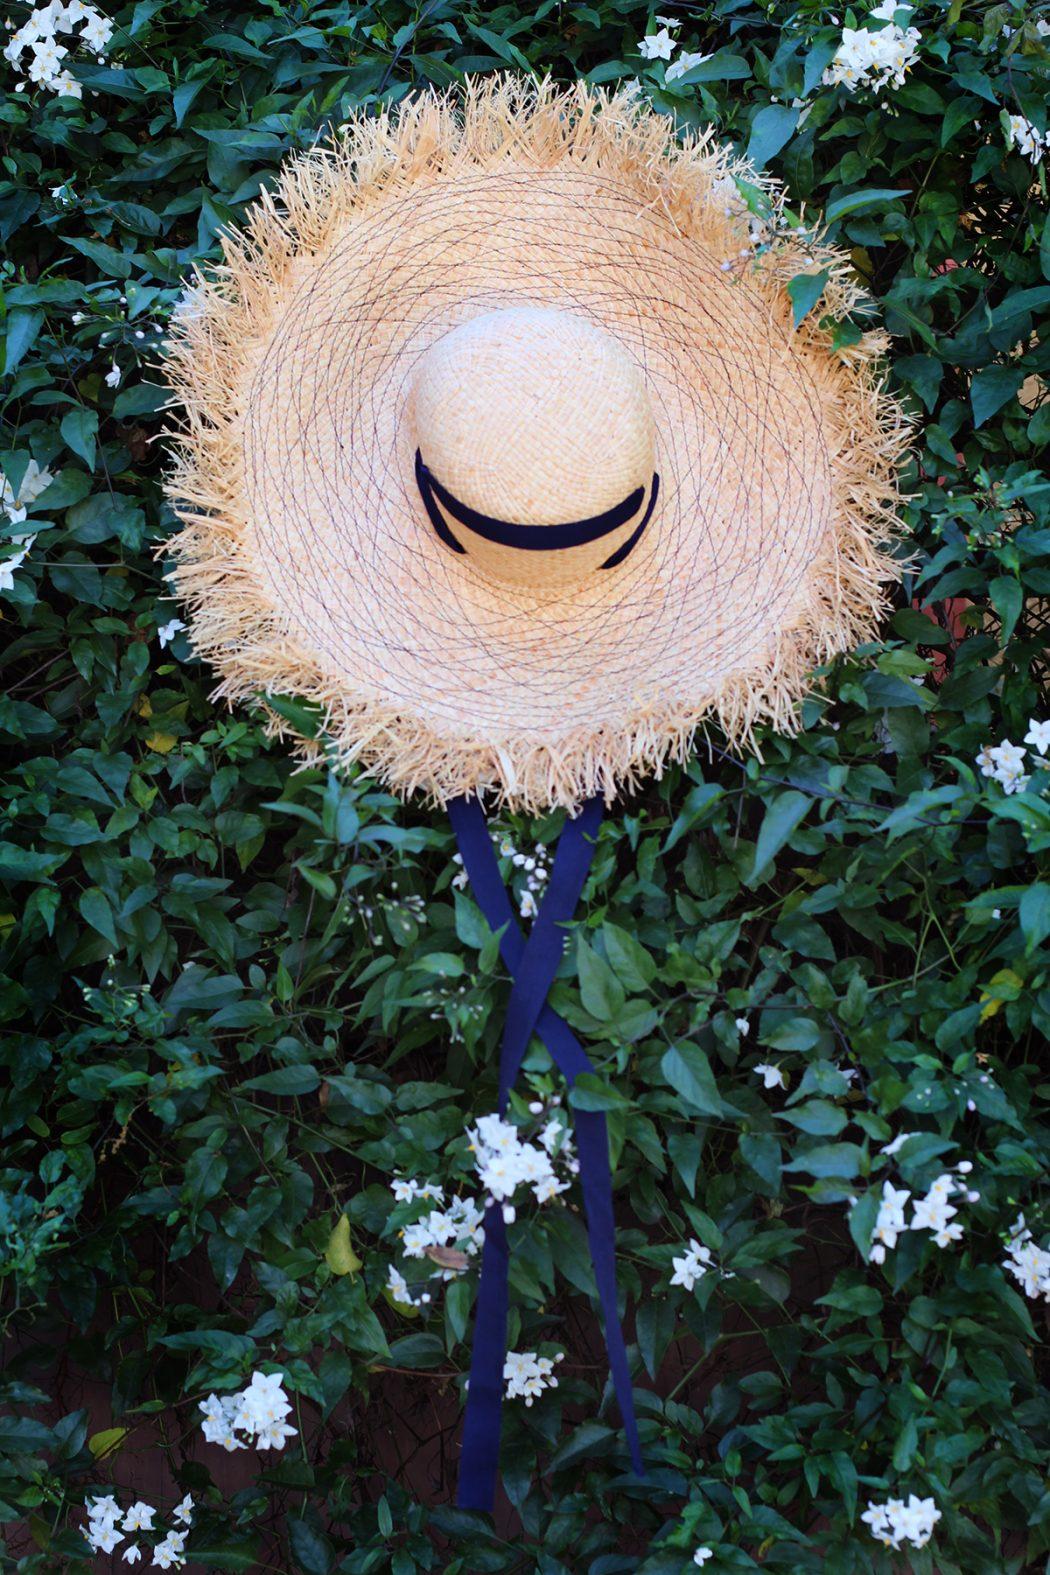 Fringed-Sun-Hat4 10 Women's Hat Trends For Summer 2020